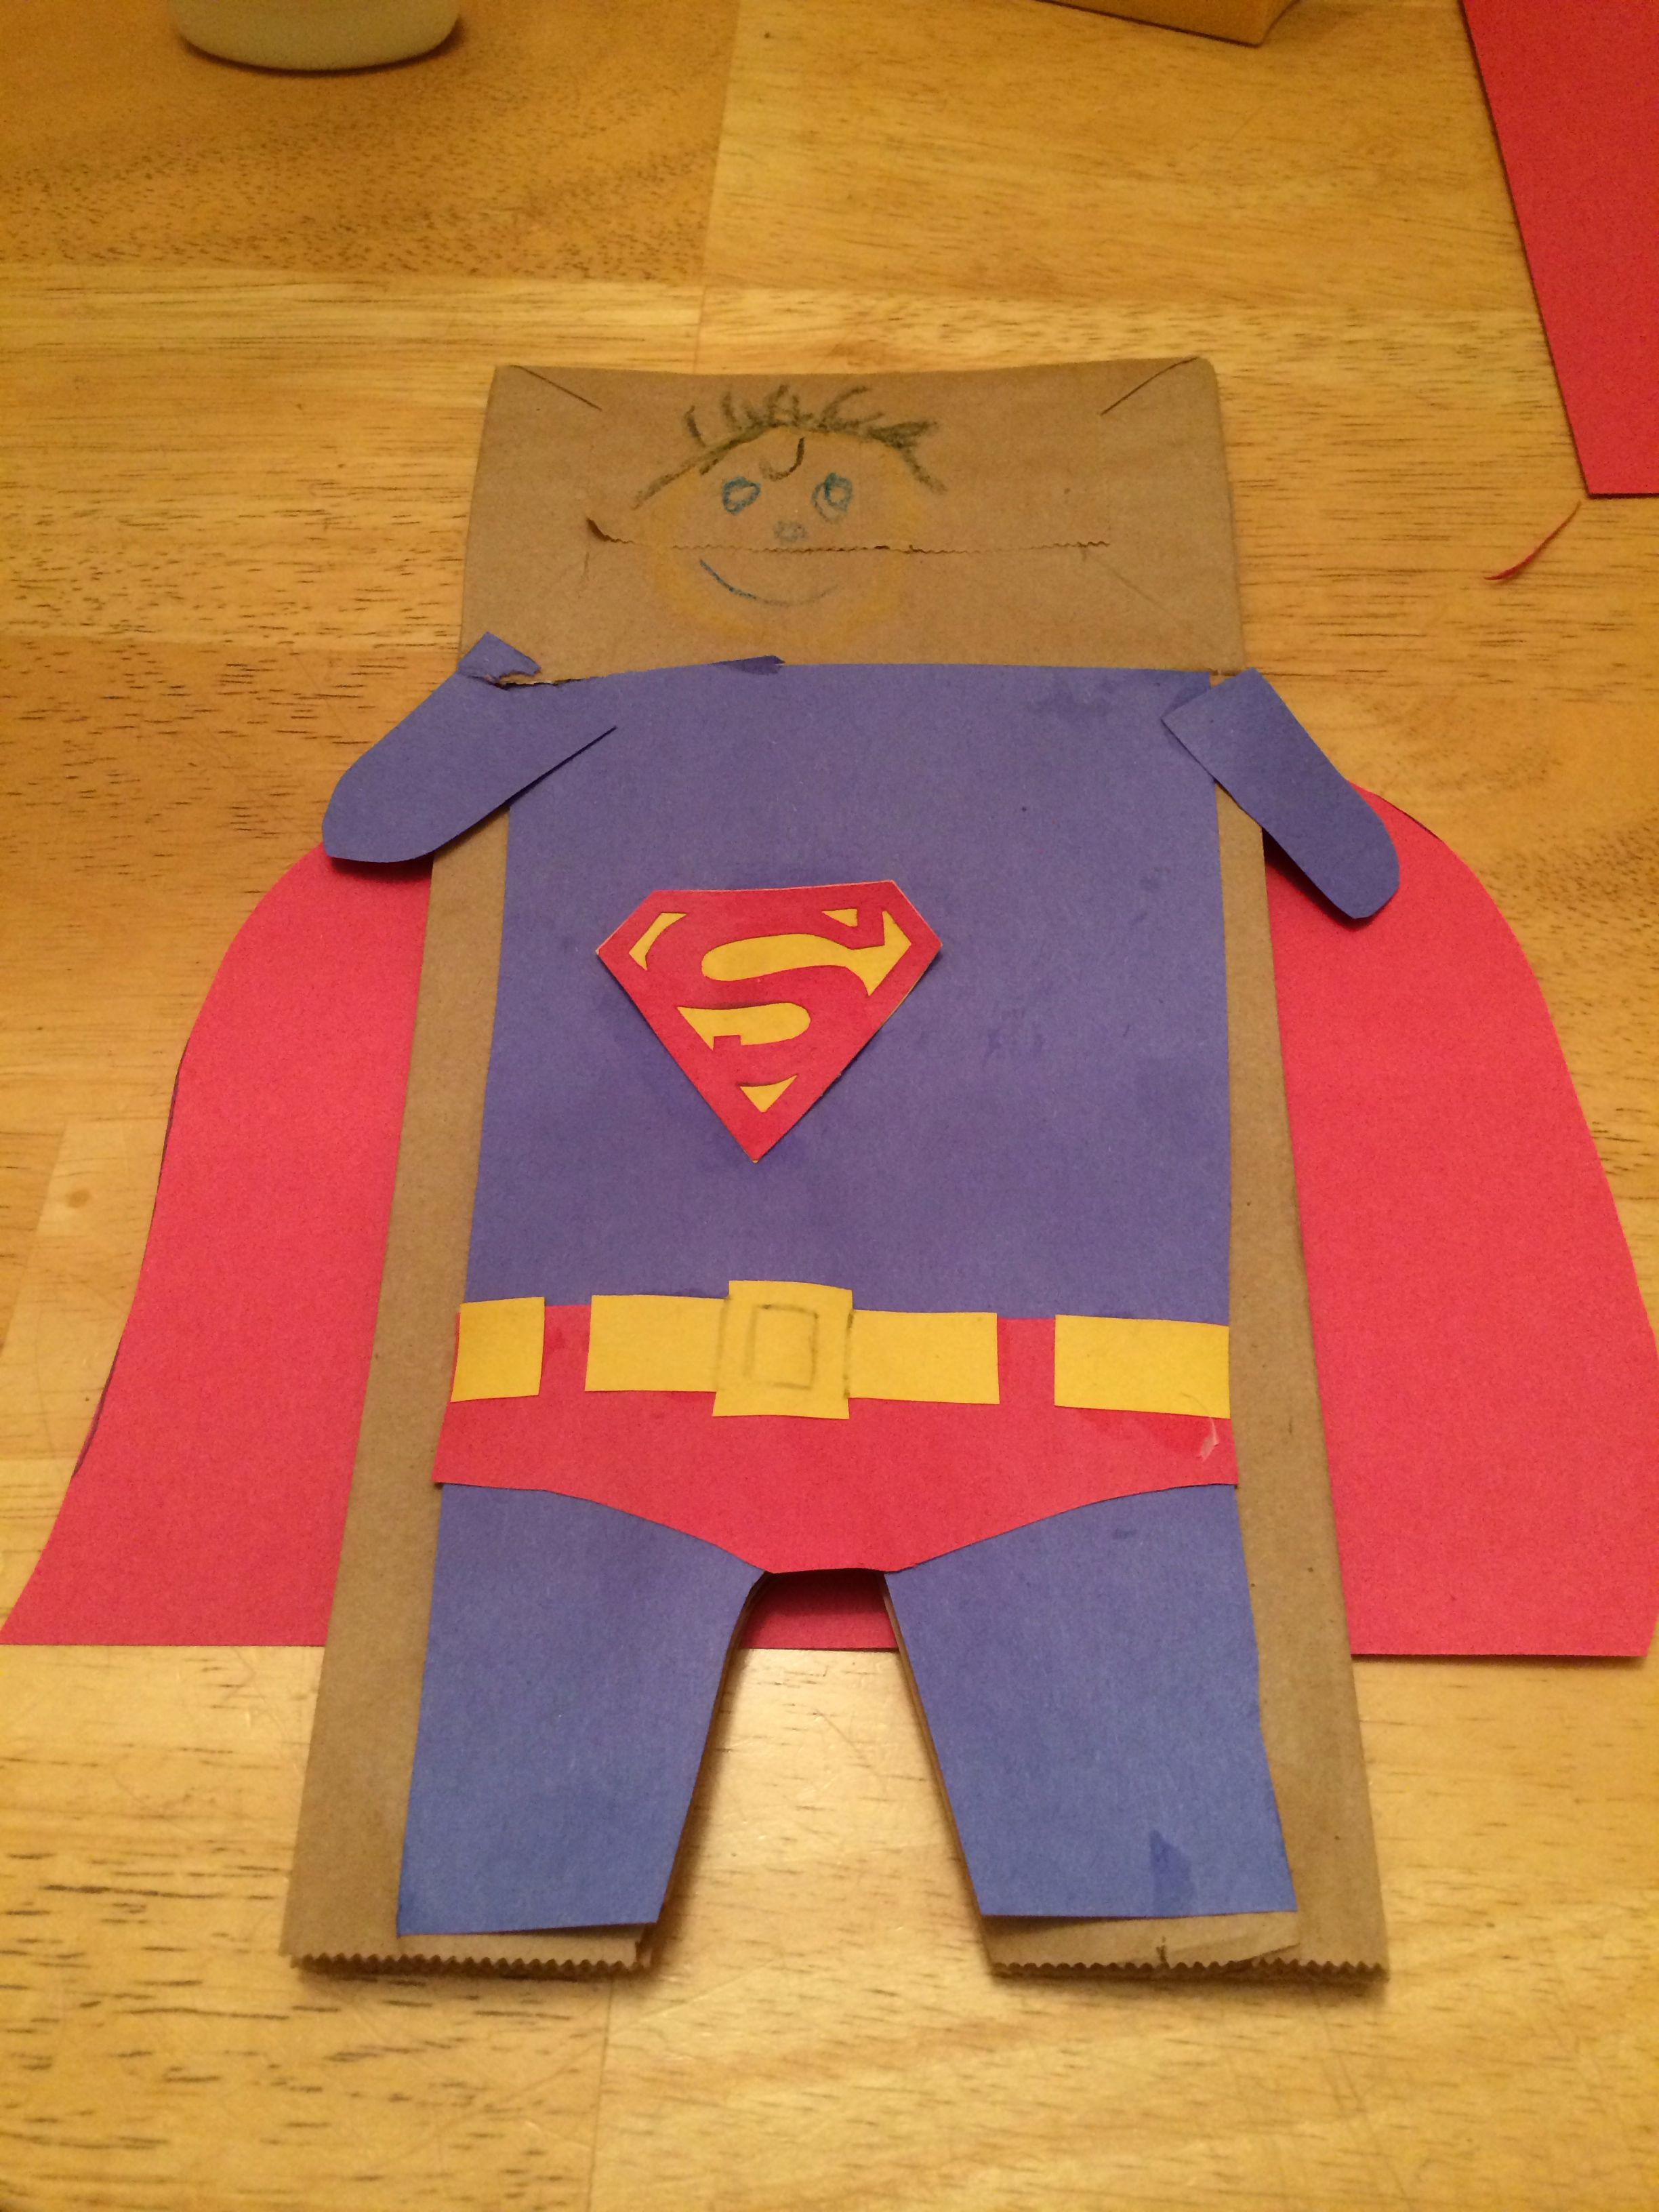 Brown Paper Bag Puppet Superman! Paper bag puppets